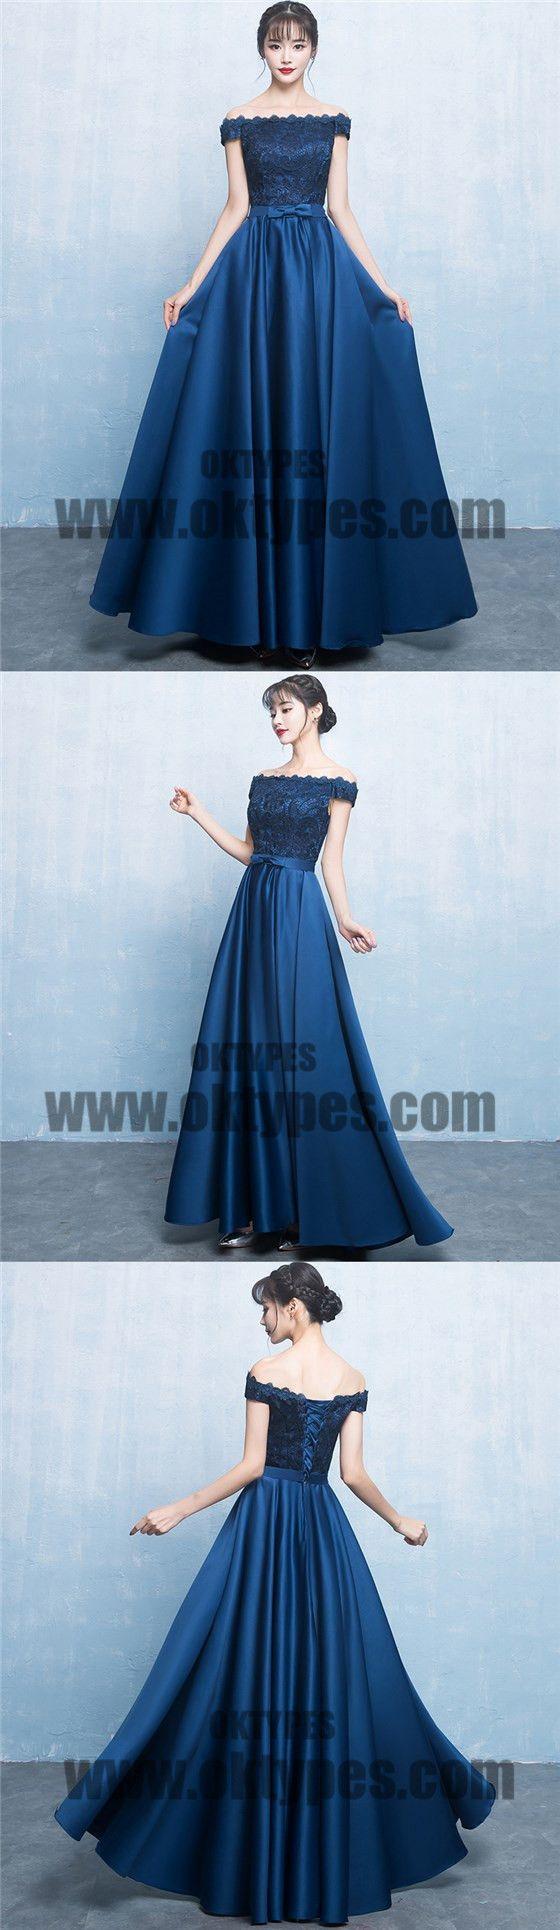 Royal blue long prom dresses lace prom dresses offshoulder prom